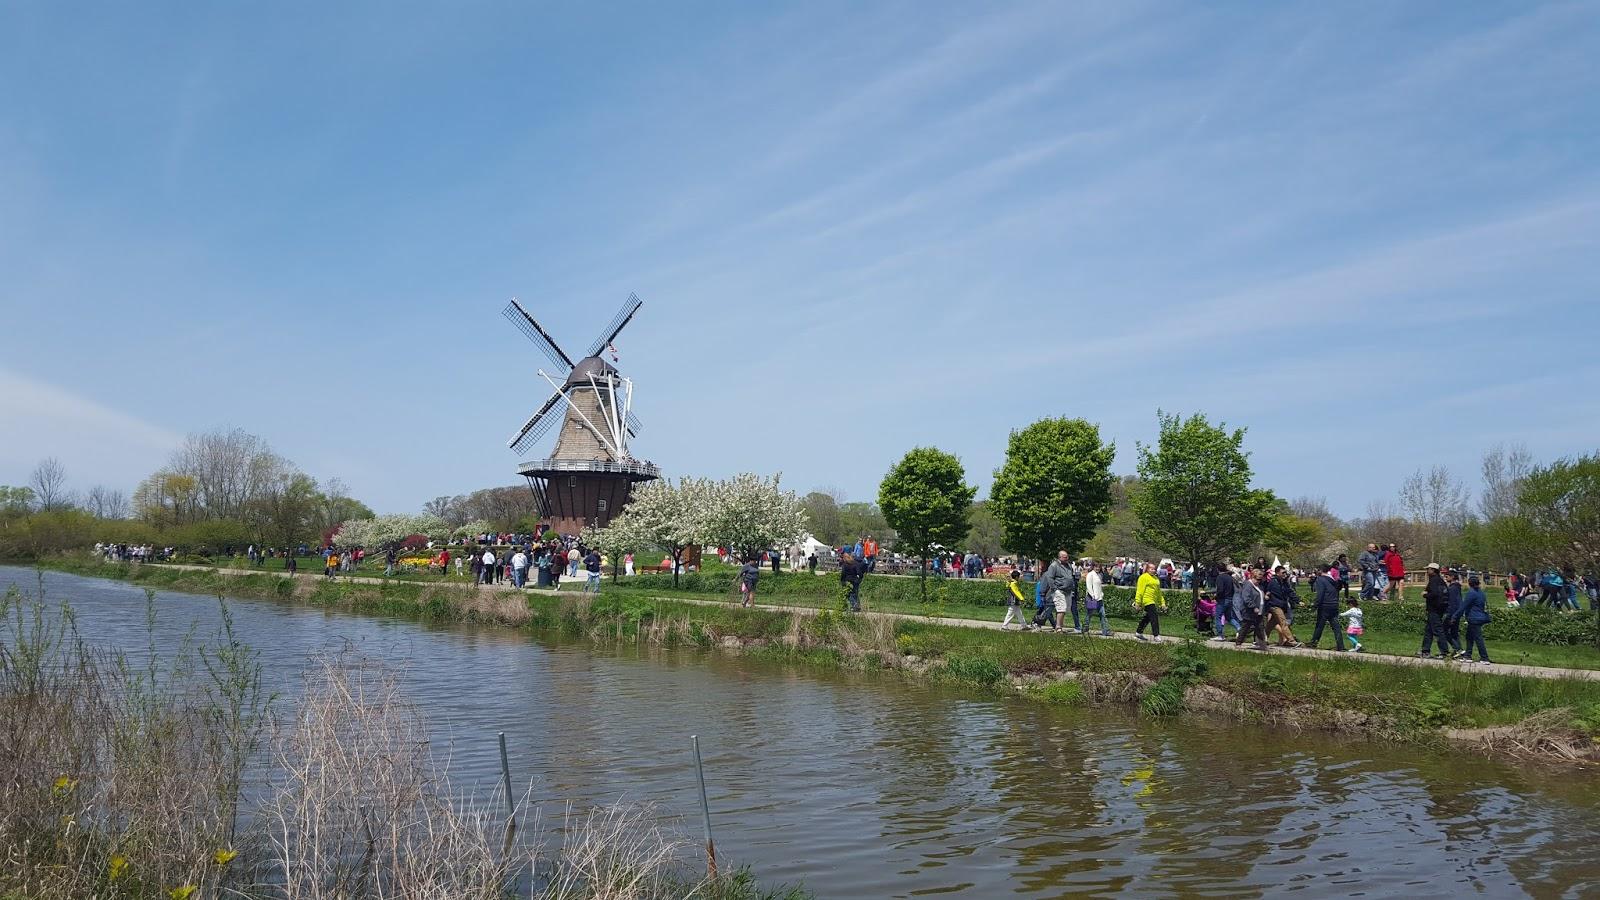 Holenderski duch w Ameryce, czyli o Festiwalu Tulipanów